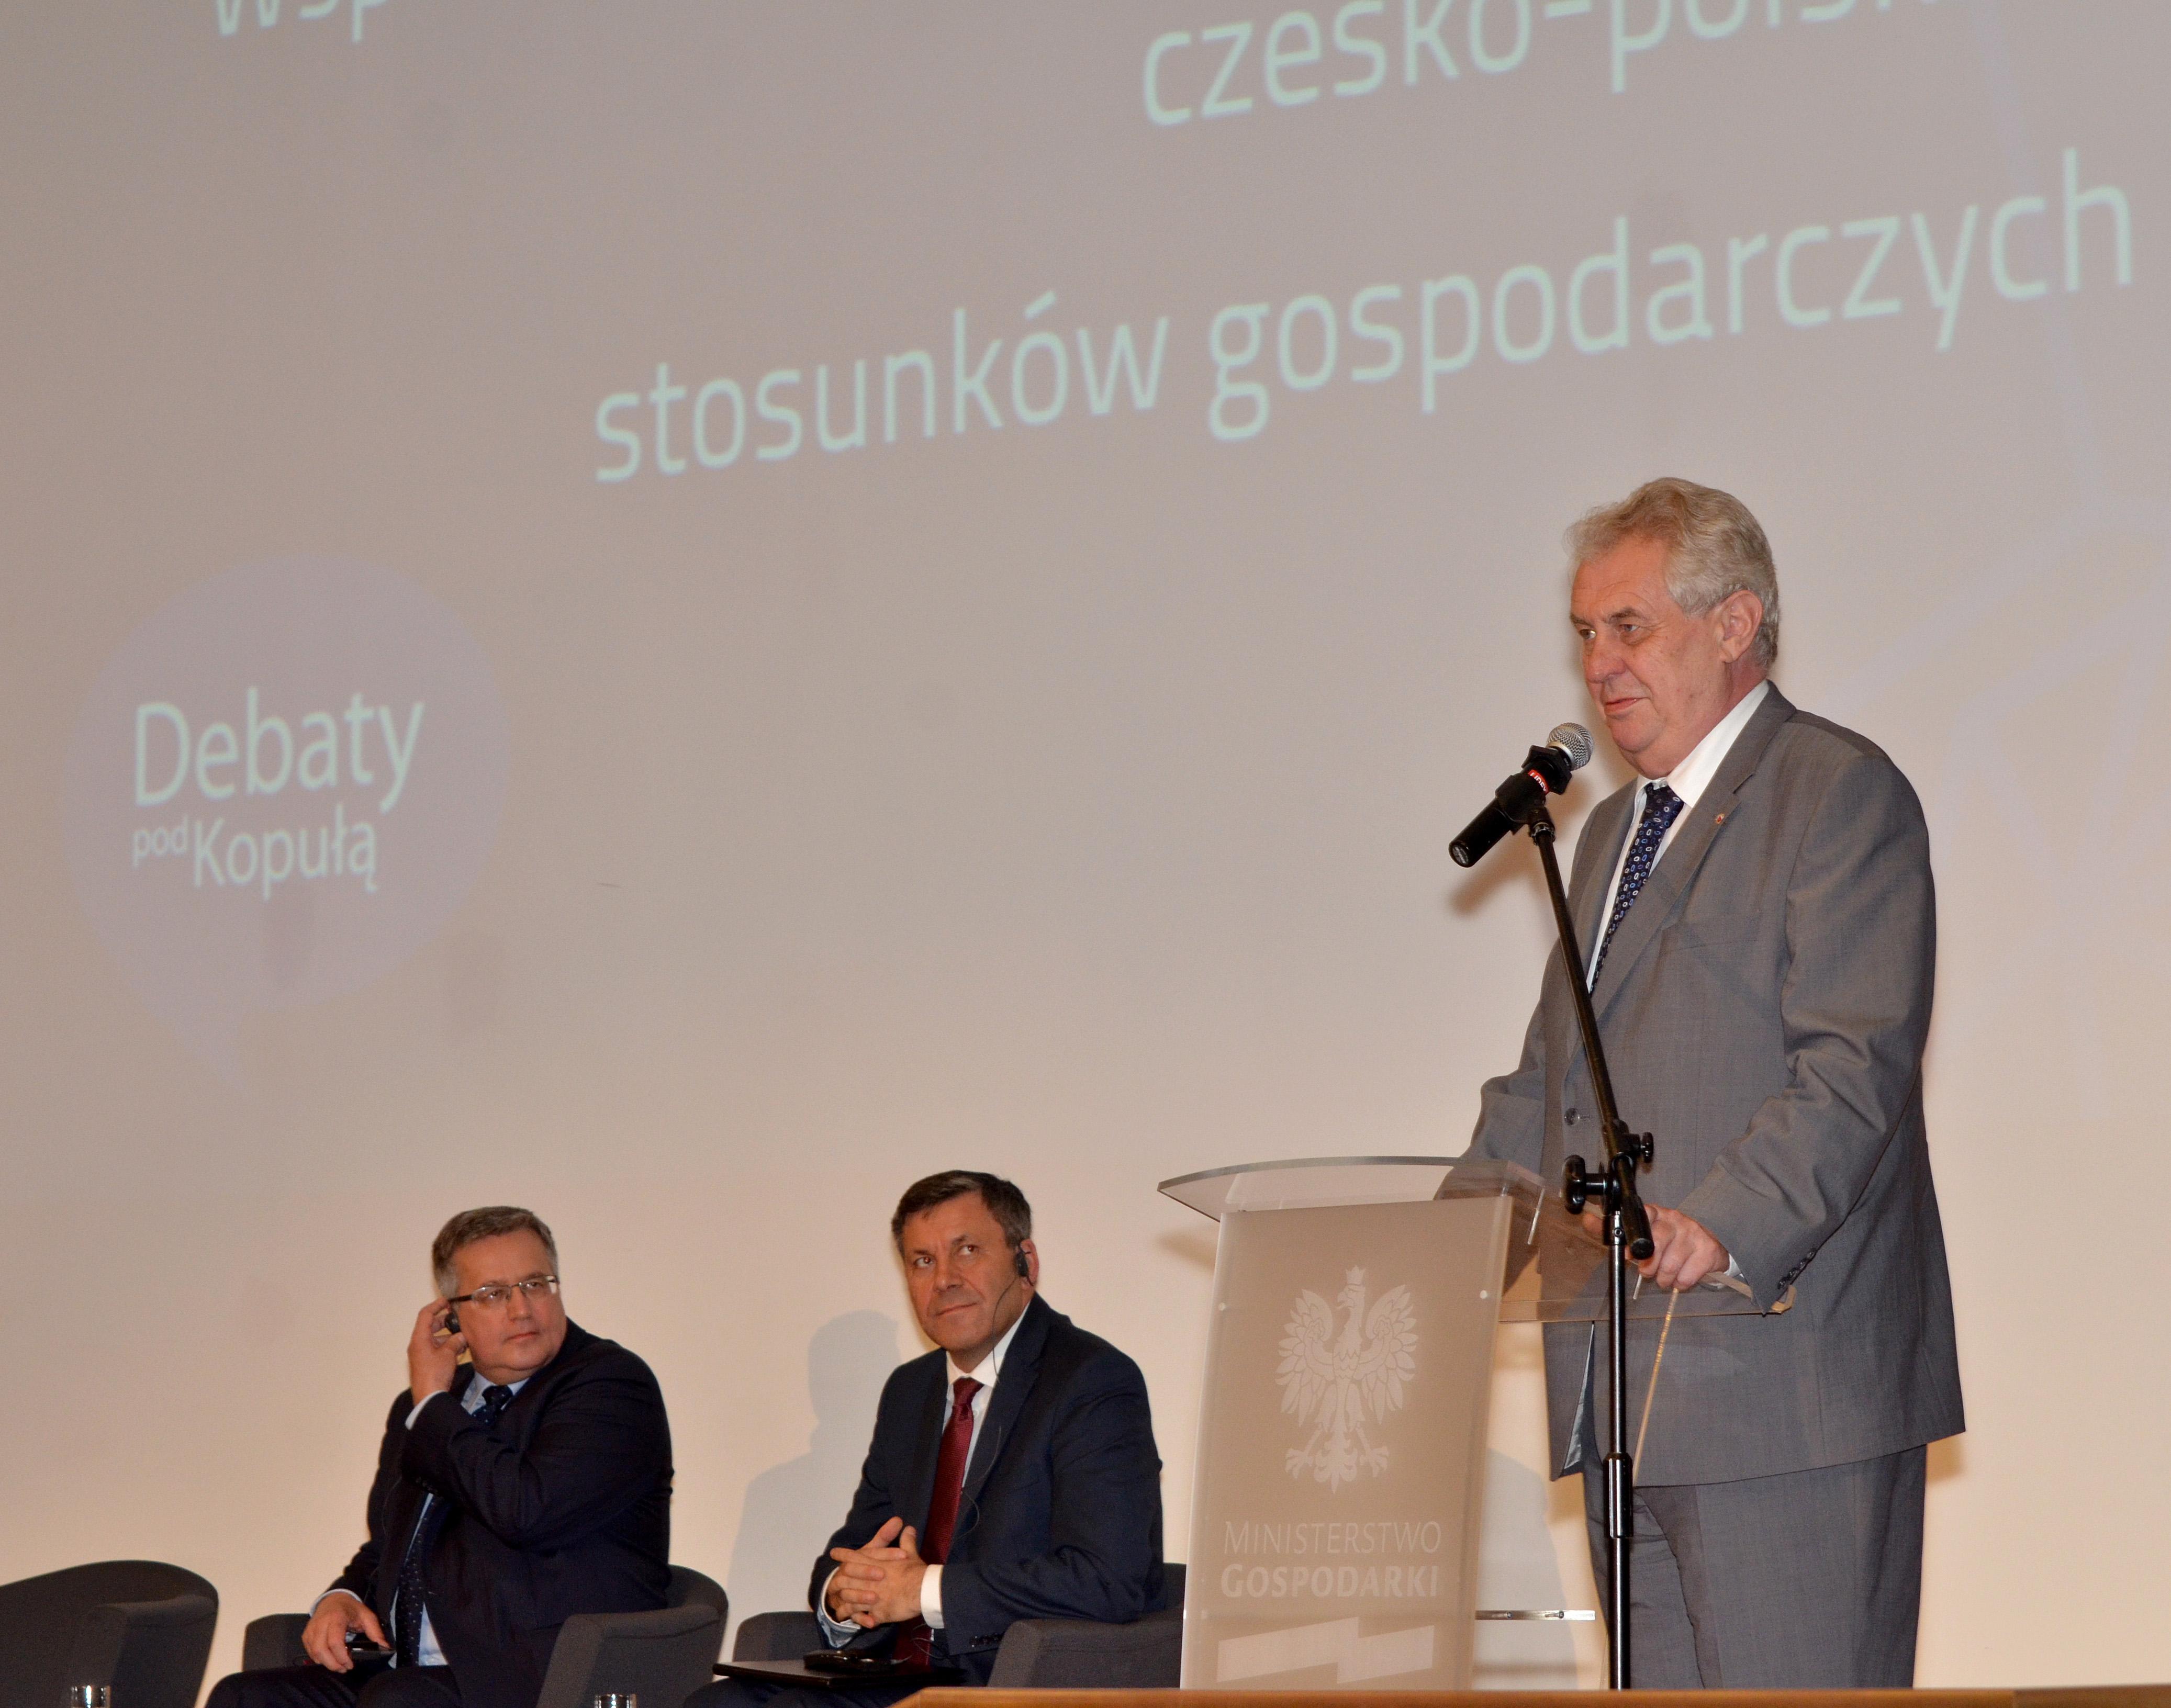 Forum Gospodarcze Czechy – Polska